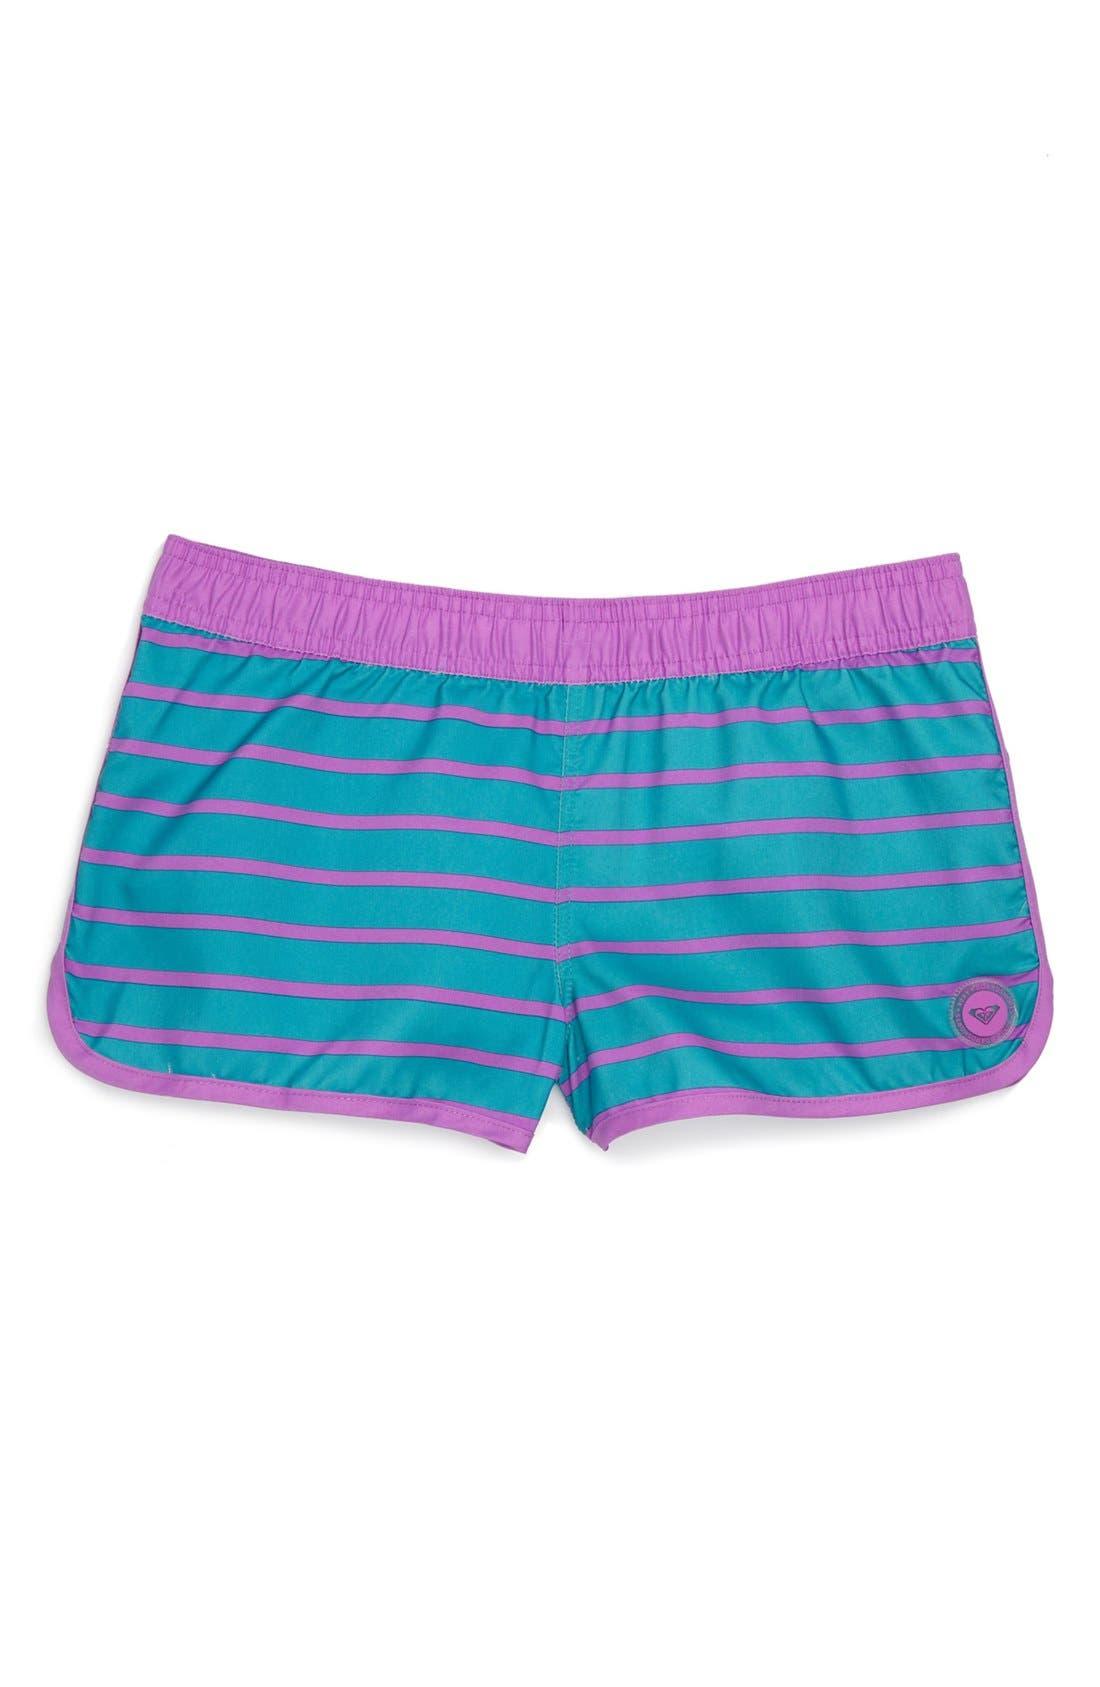 Alternate Image 1 Selected - Roxy 'Tropic Sun' Board Shorts (Big Girls)